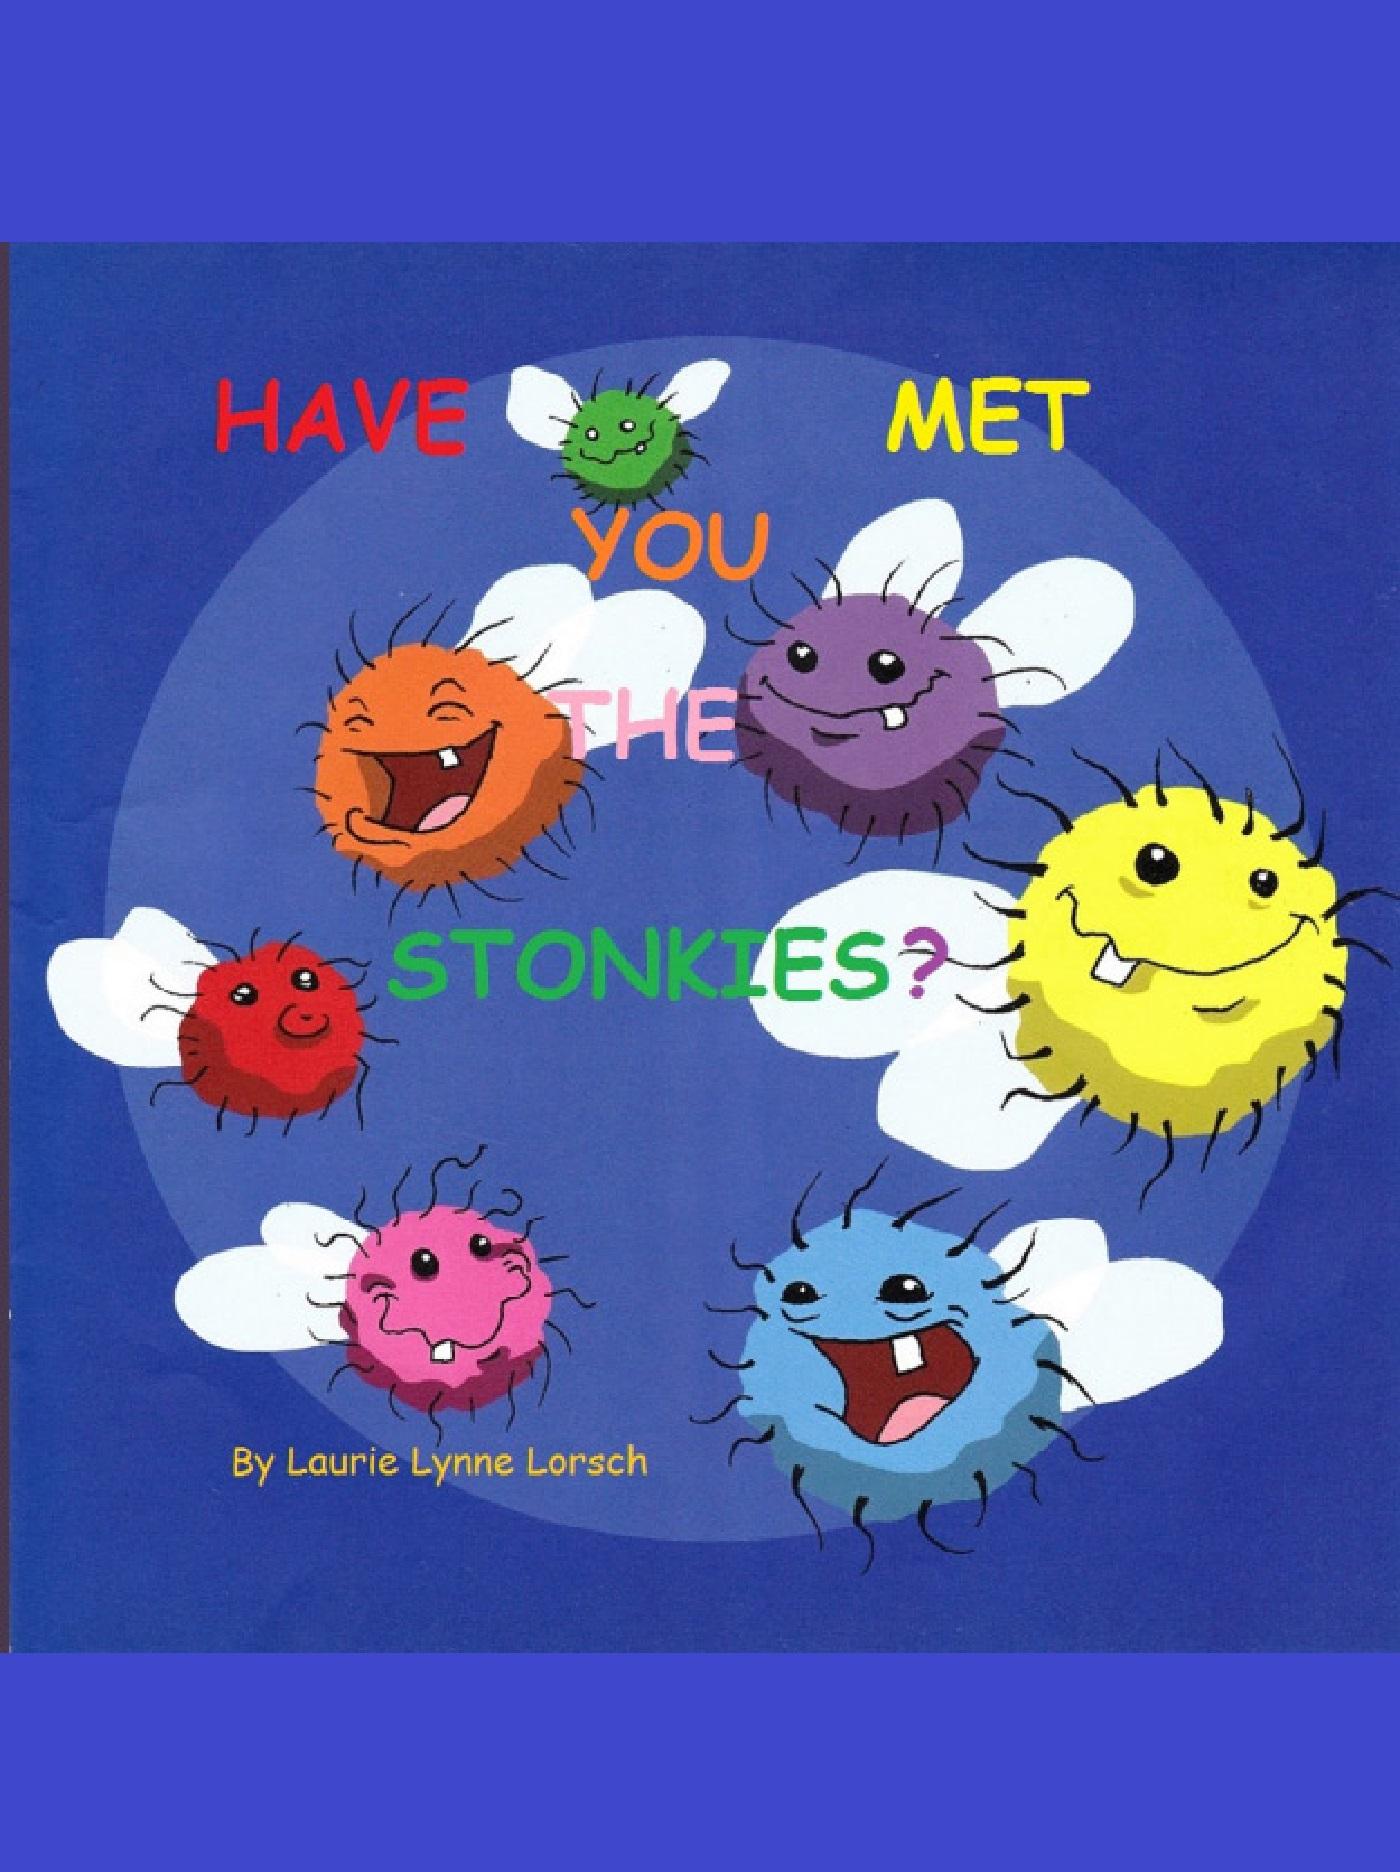 Have You Met The Stonkies?